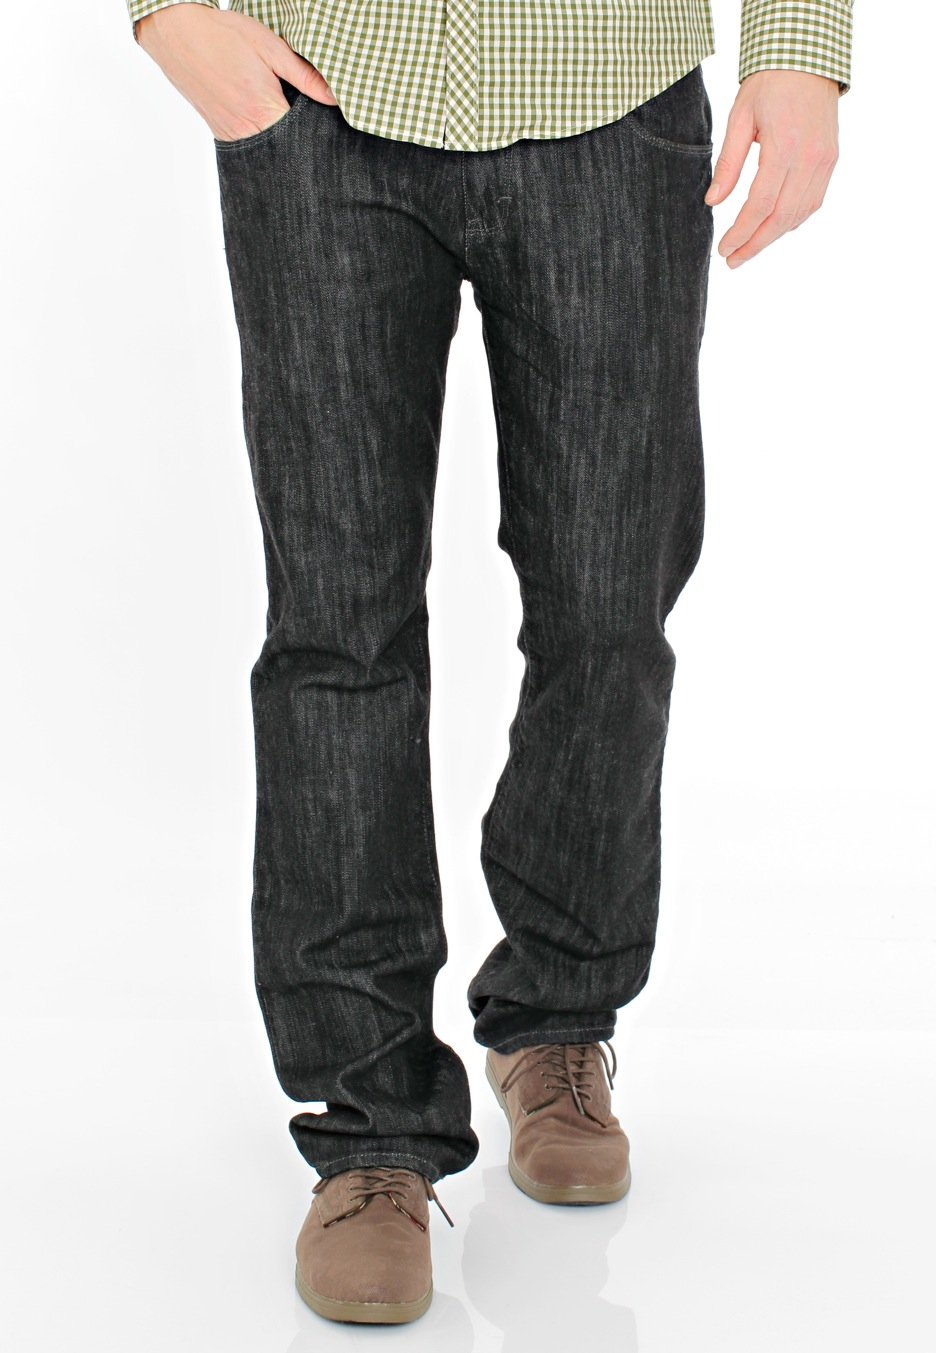 black vans and jeans